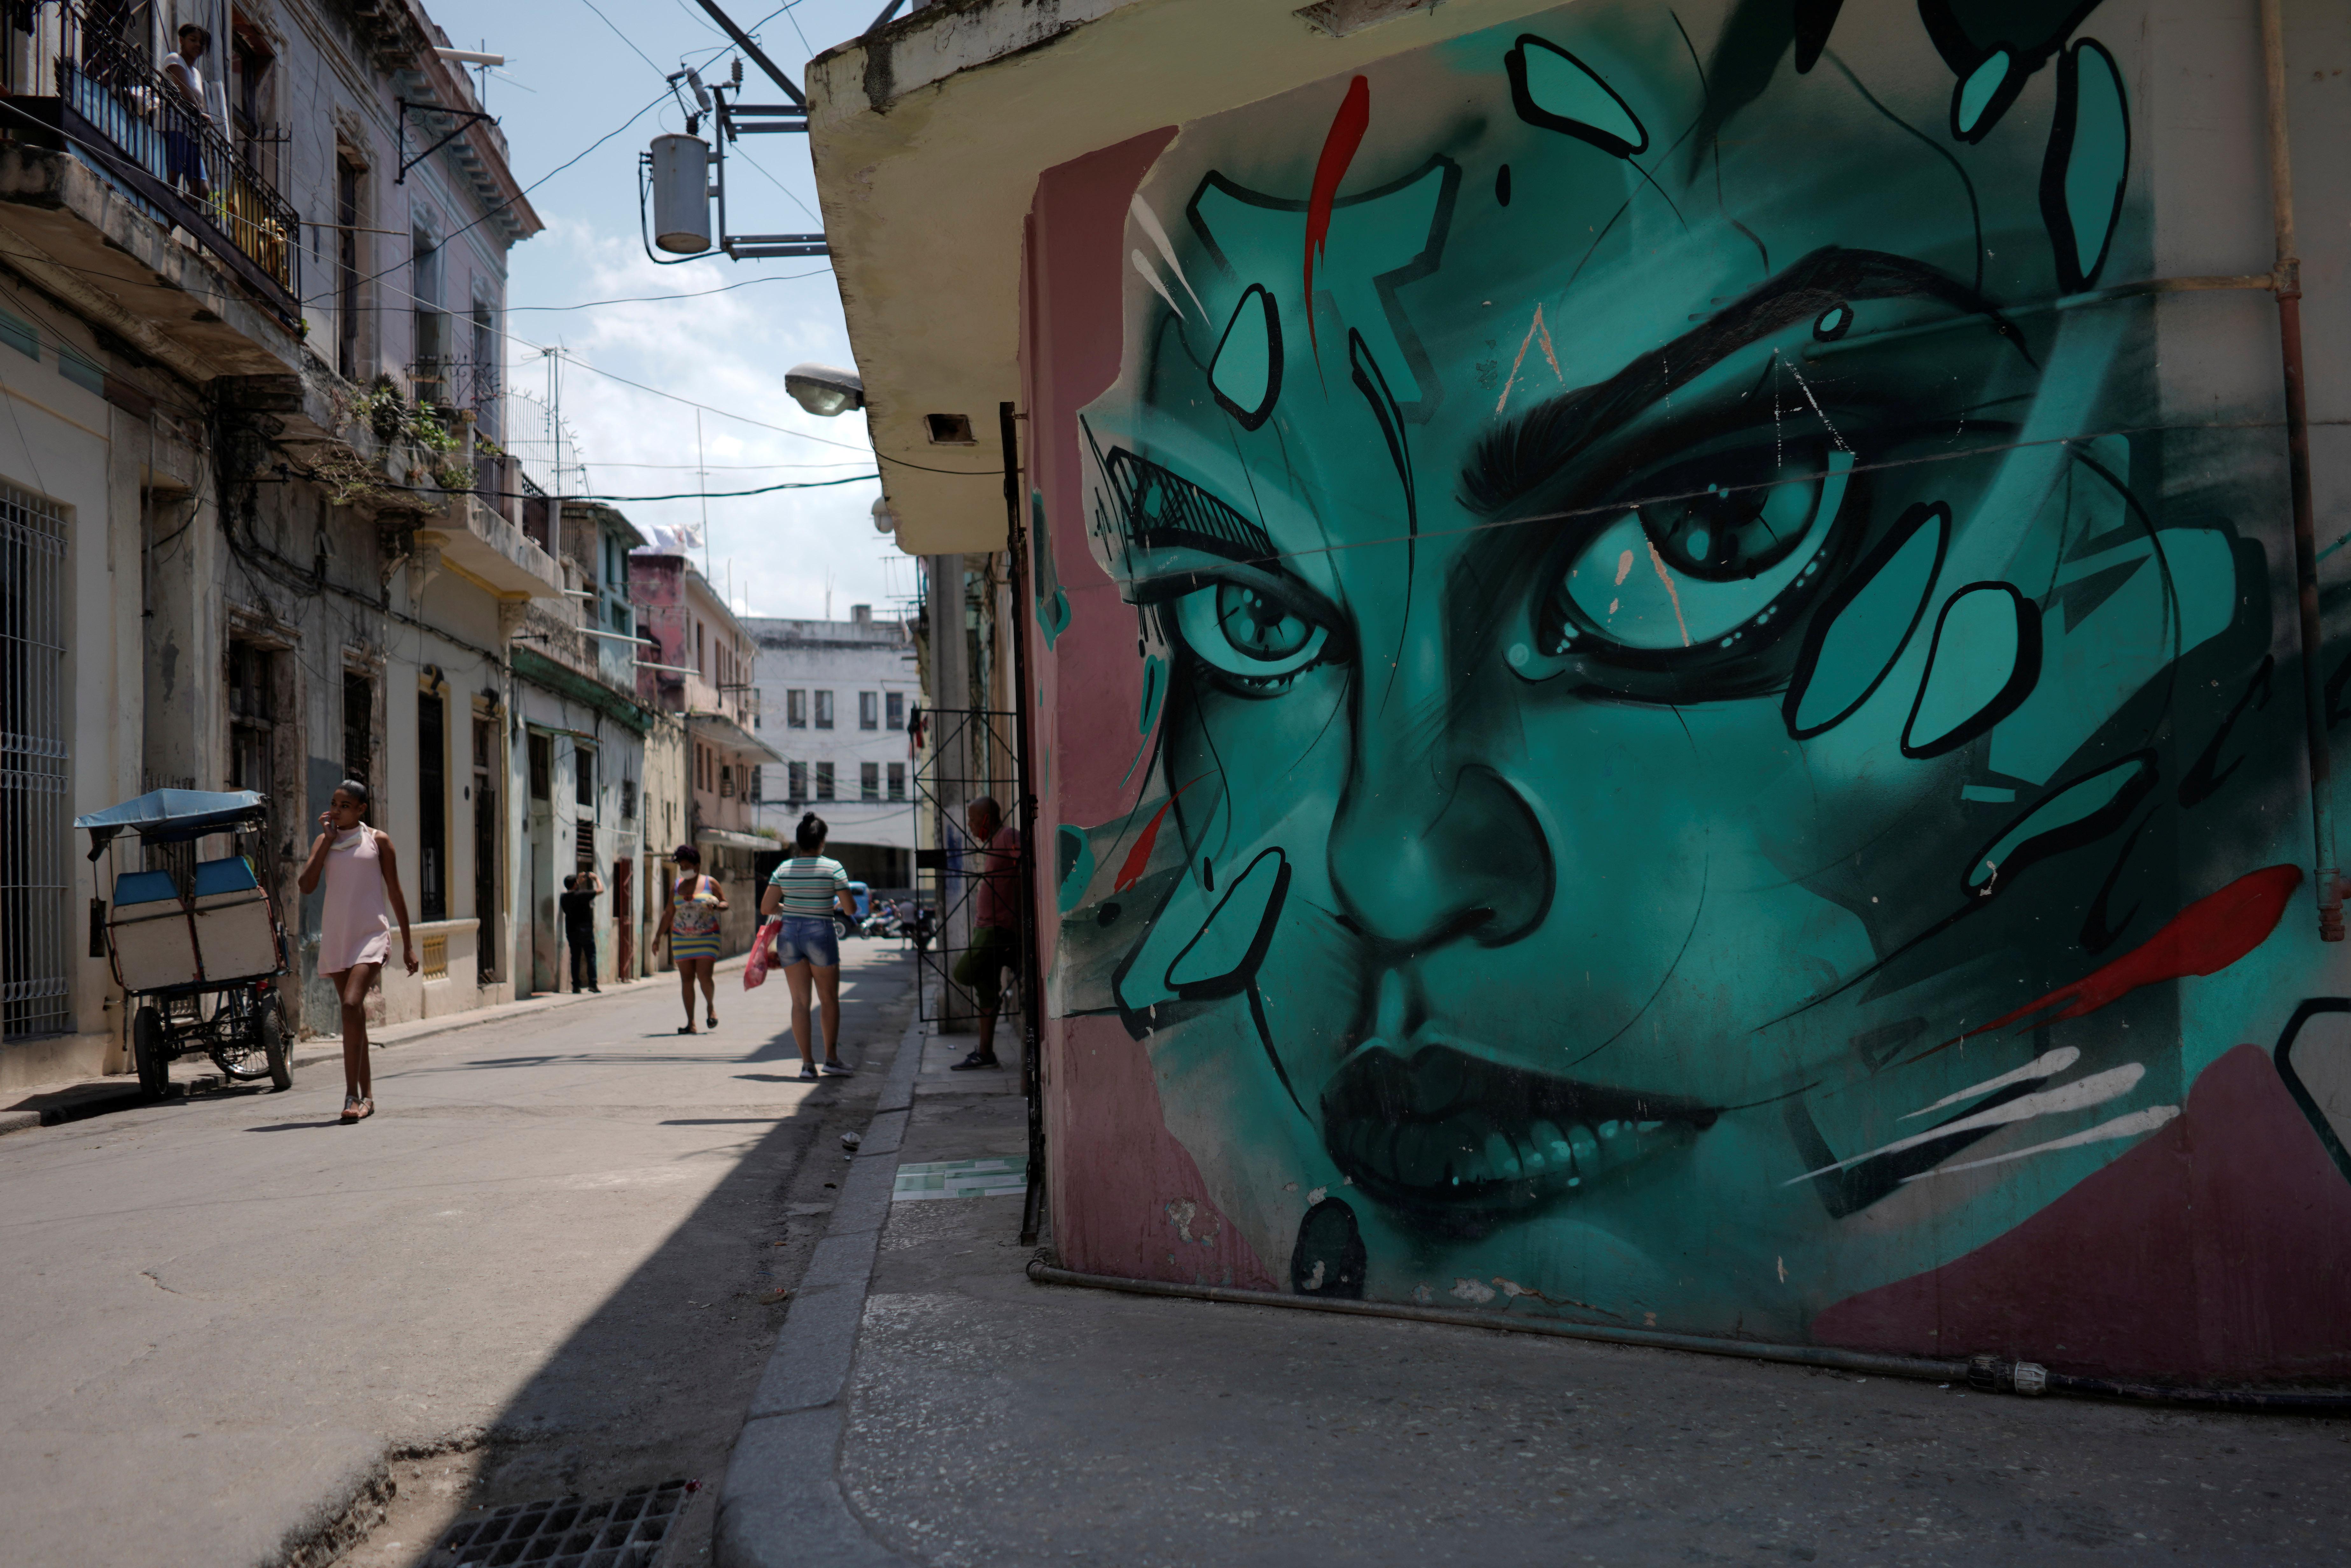 A view of a painting in San Isidro road in Havana, Cuba, April 6, 2021. REUTERS/Alexandre Meneghini